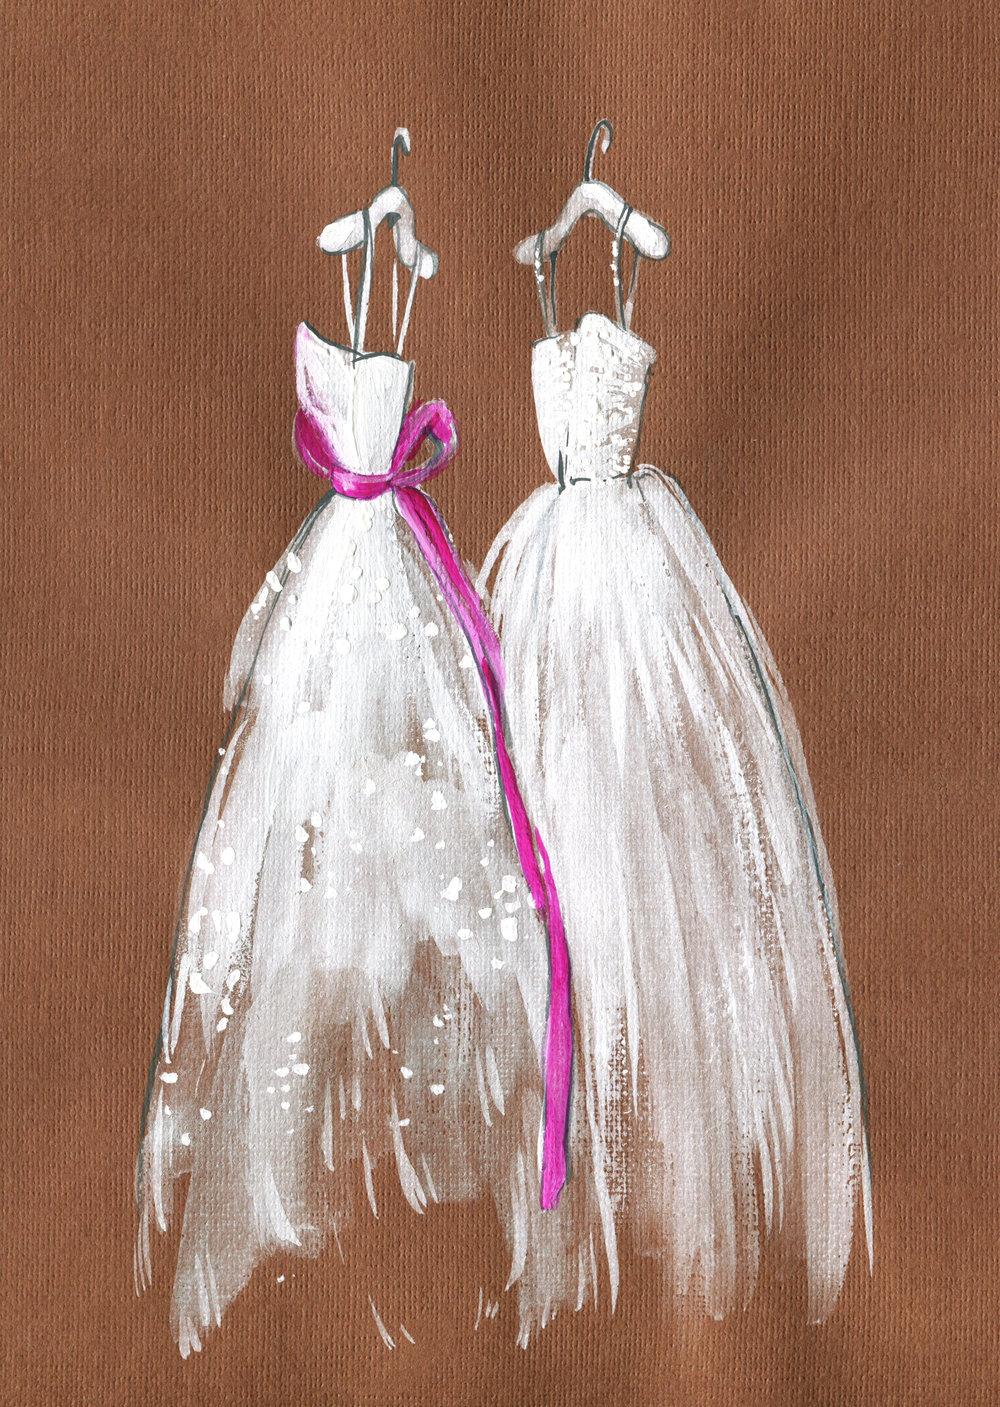 image-bridal-shutterstock_191504459.jpg